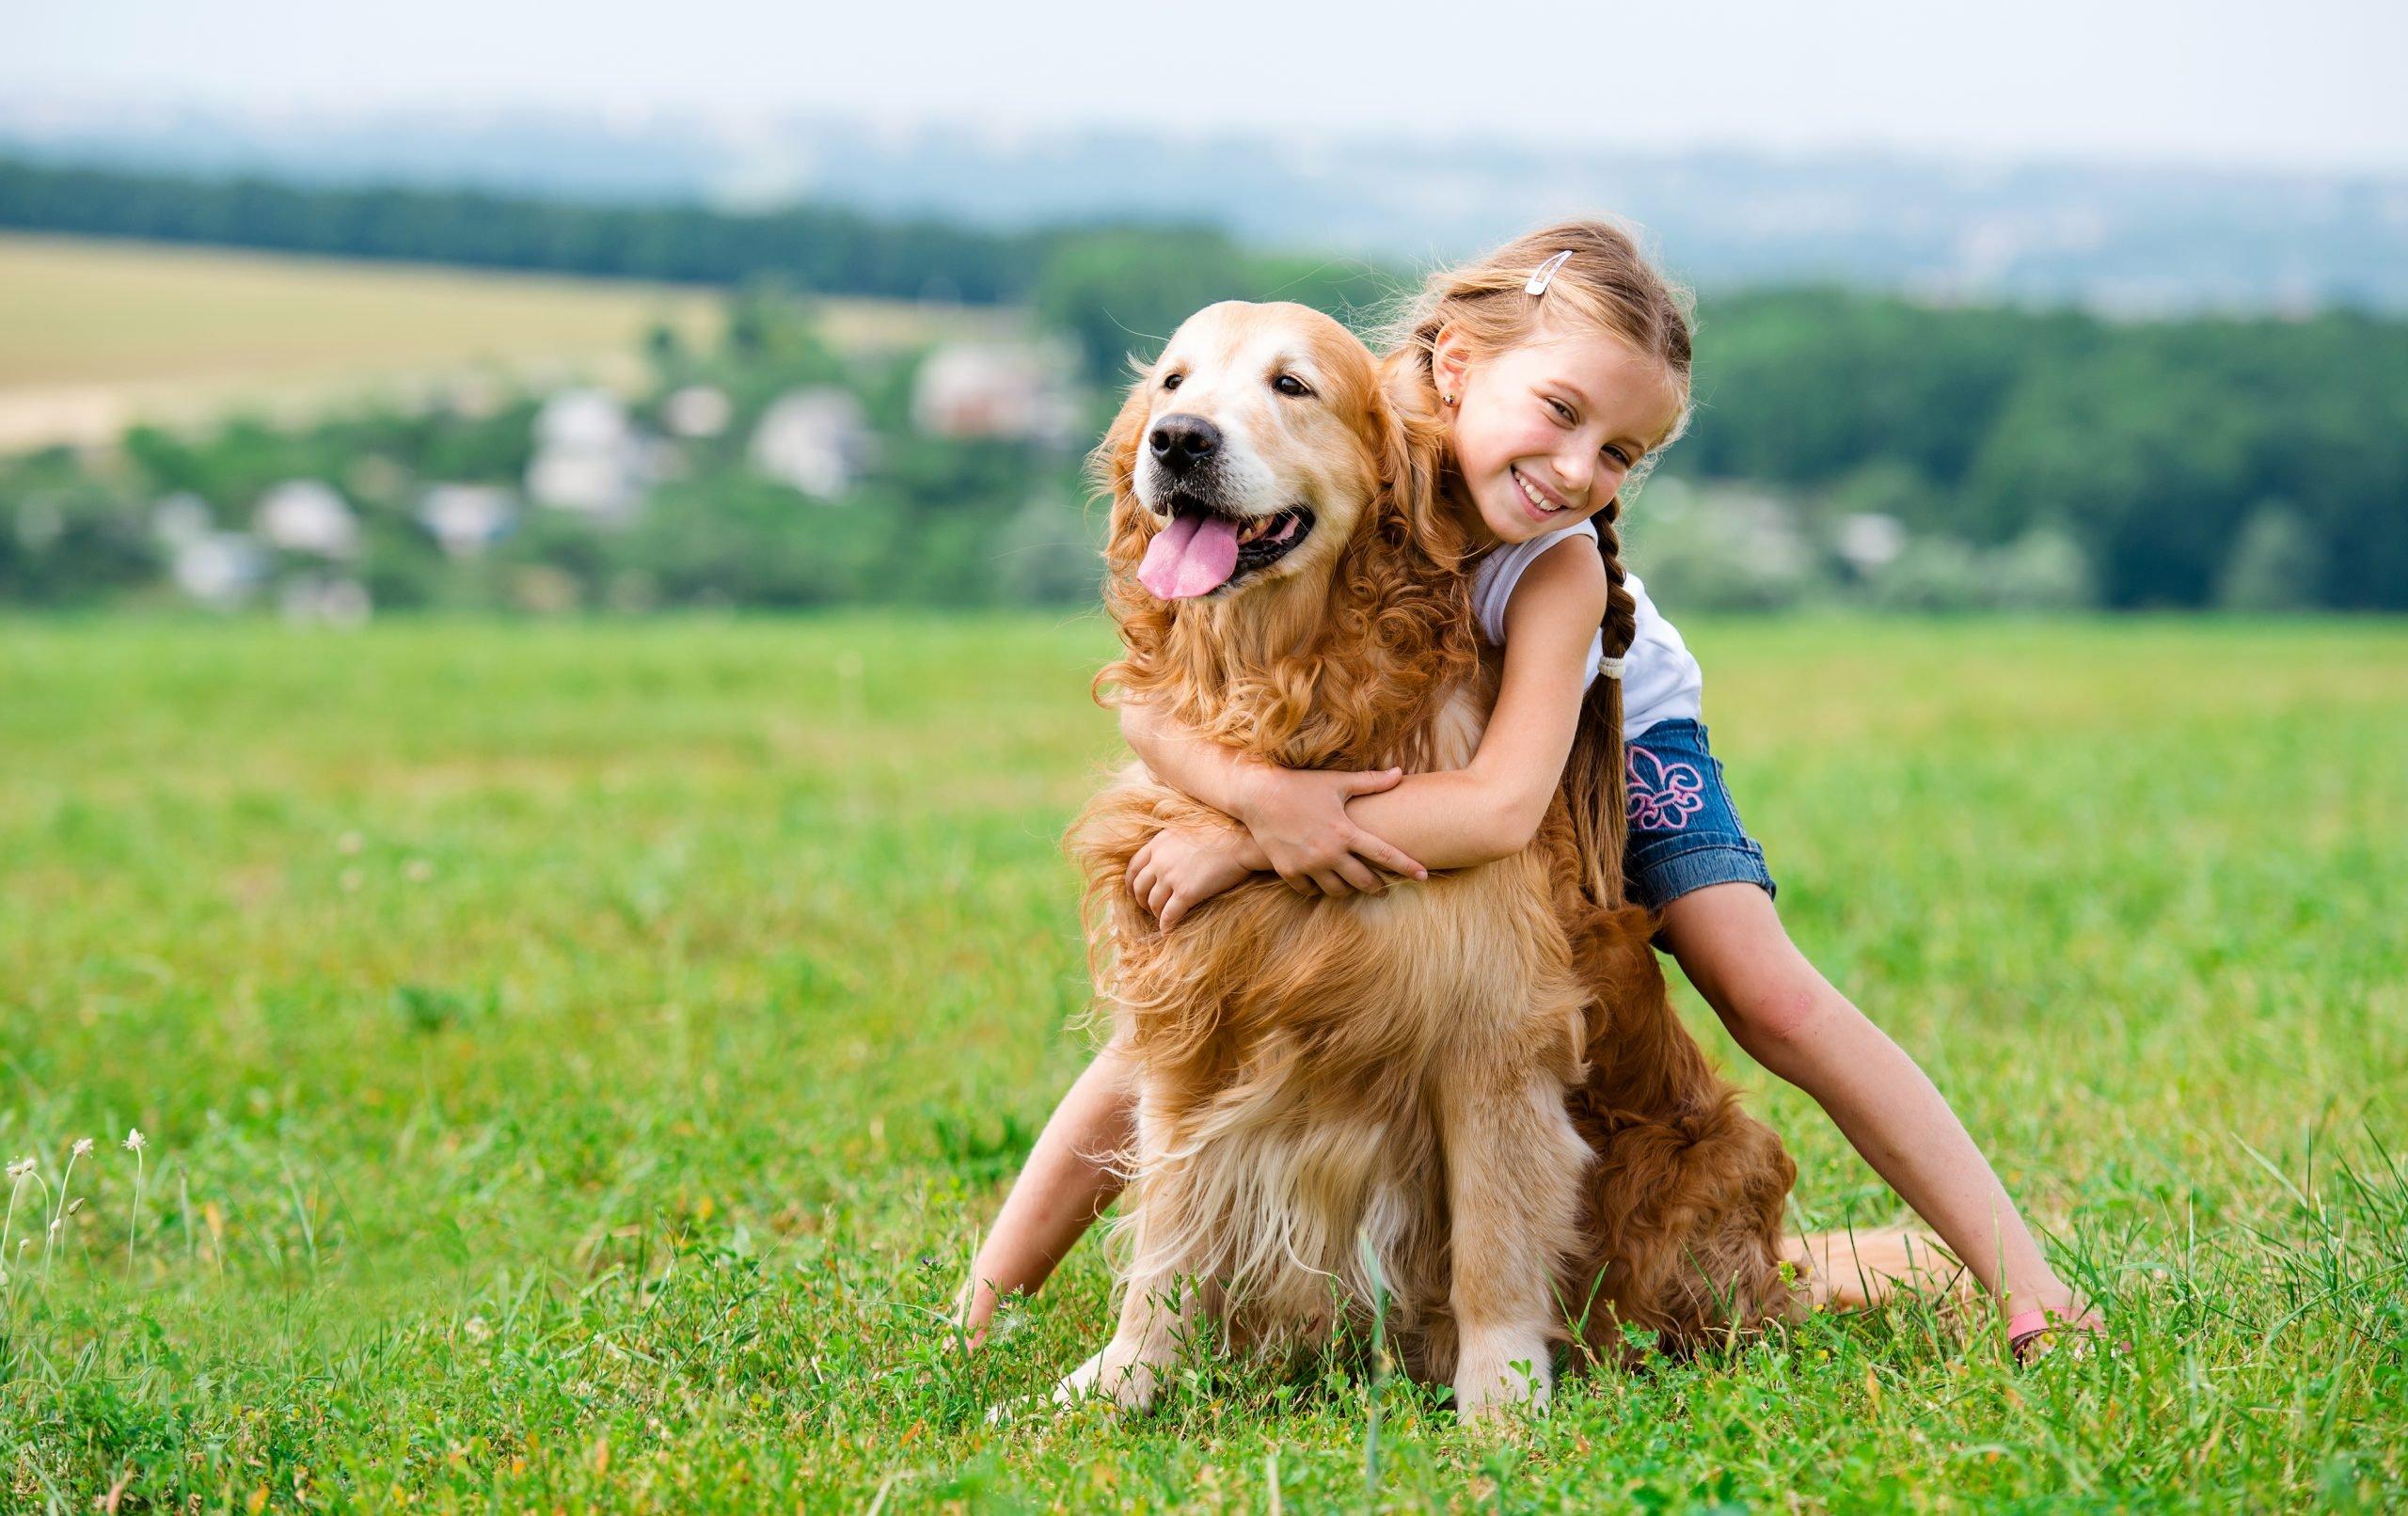 Little girl with golden retriever adopting a dog